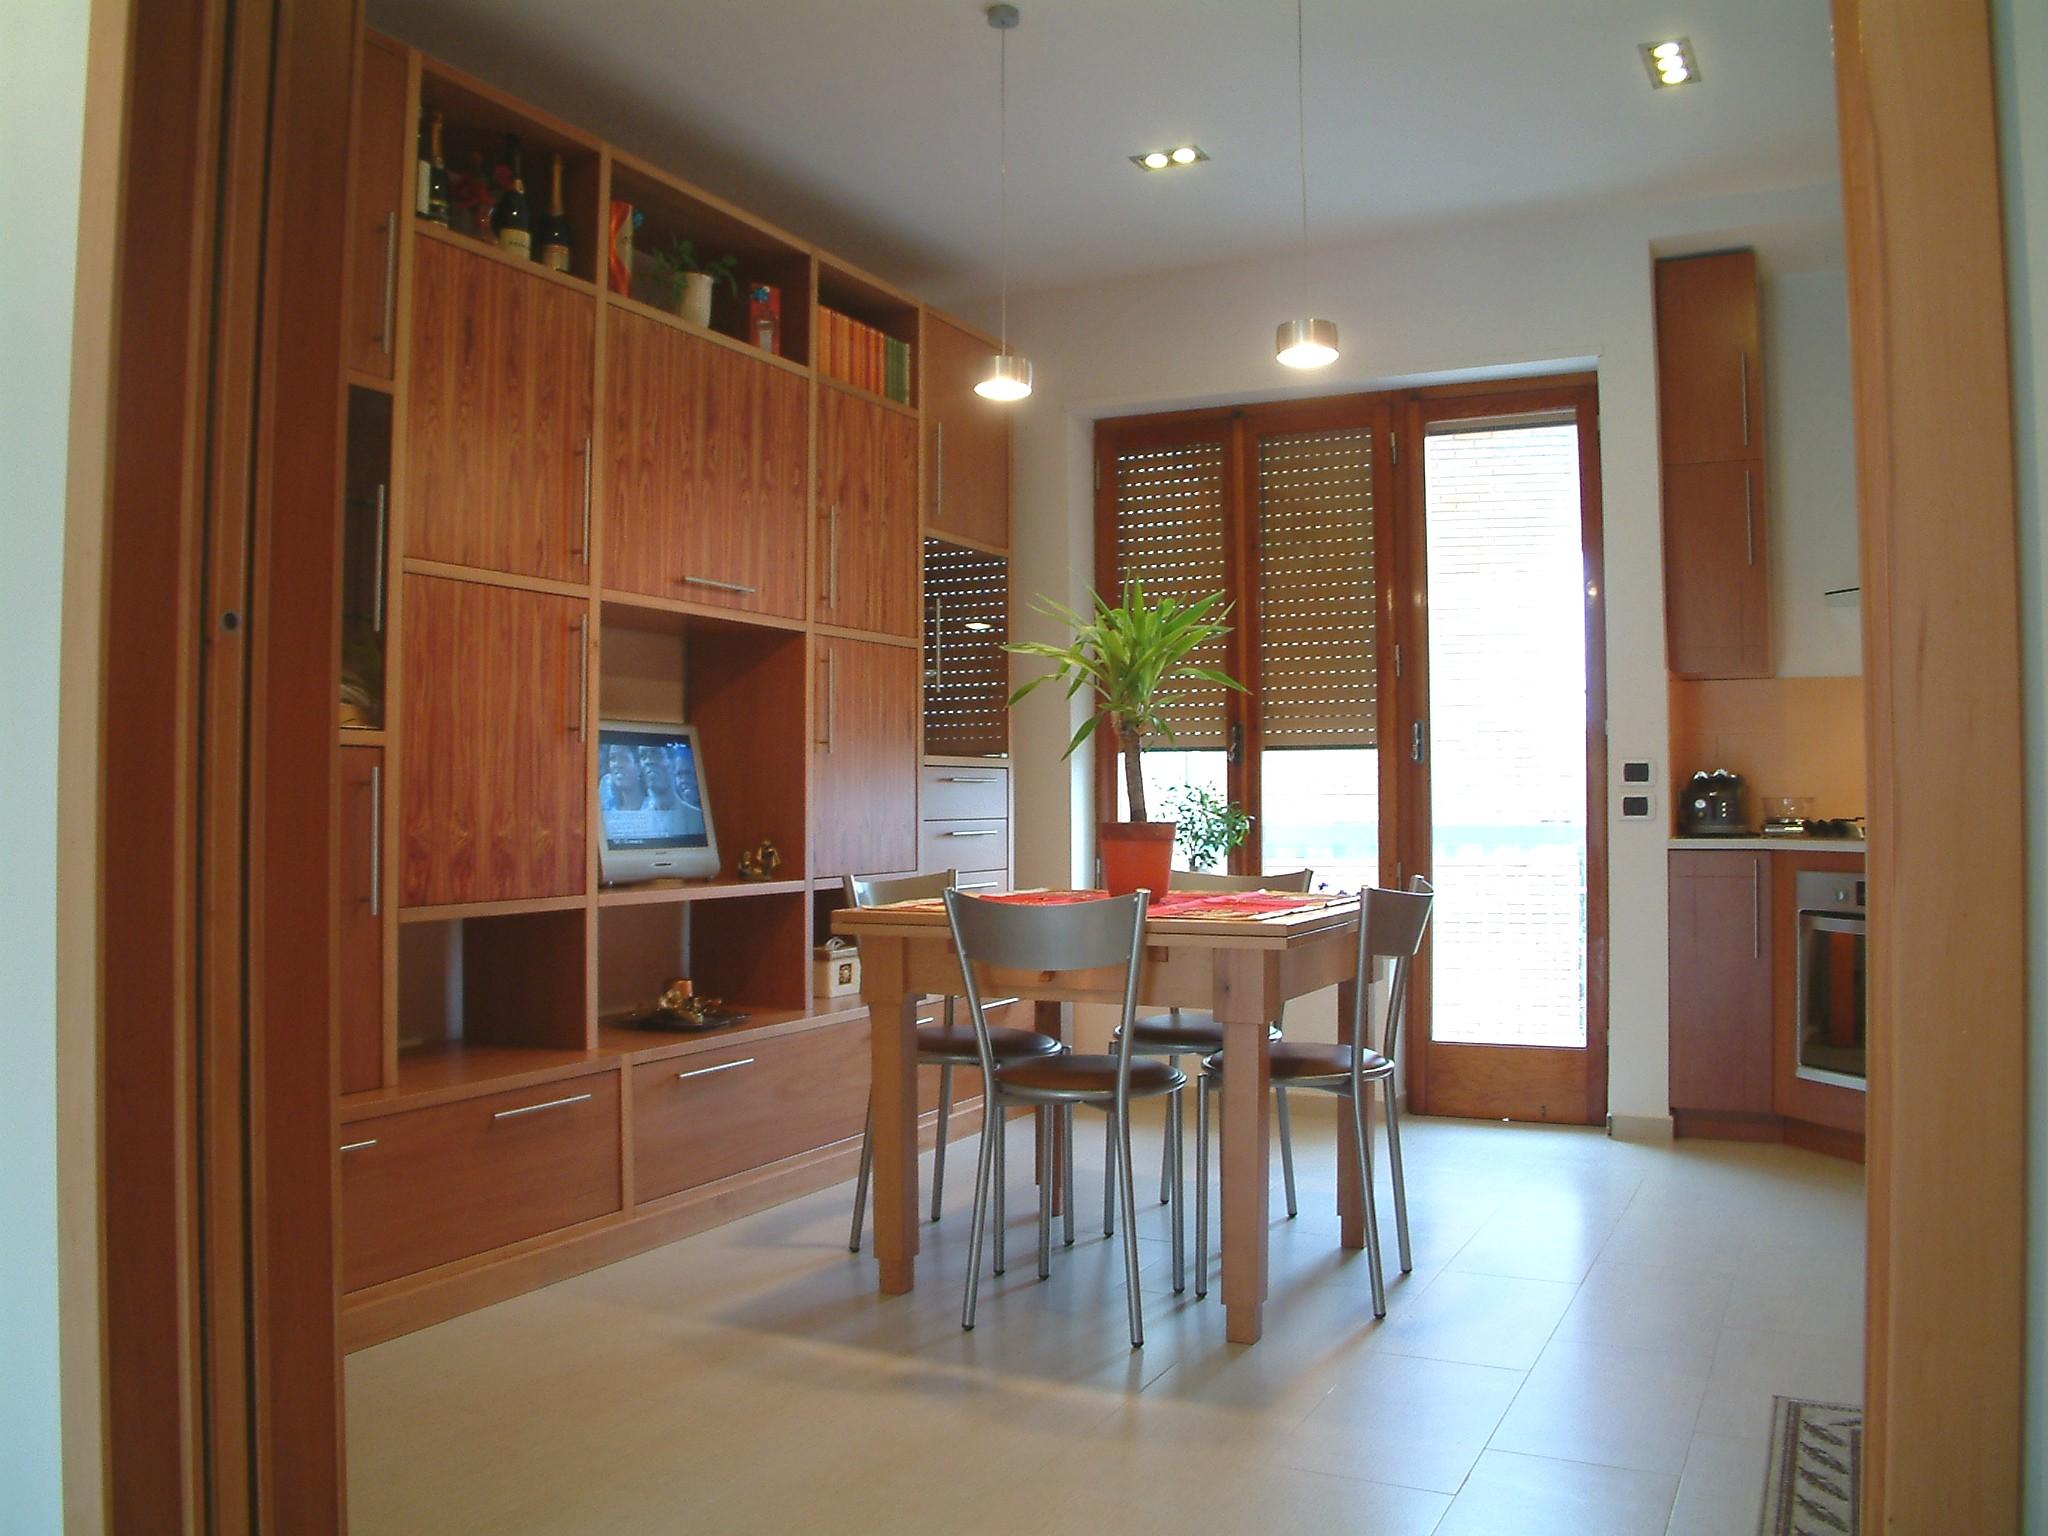 Awesome progetti cucine in muratura rustiche ideas ideas - Cucine in muratura rustiche ...